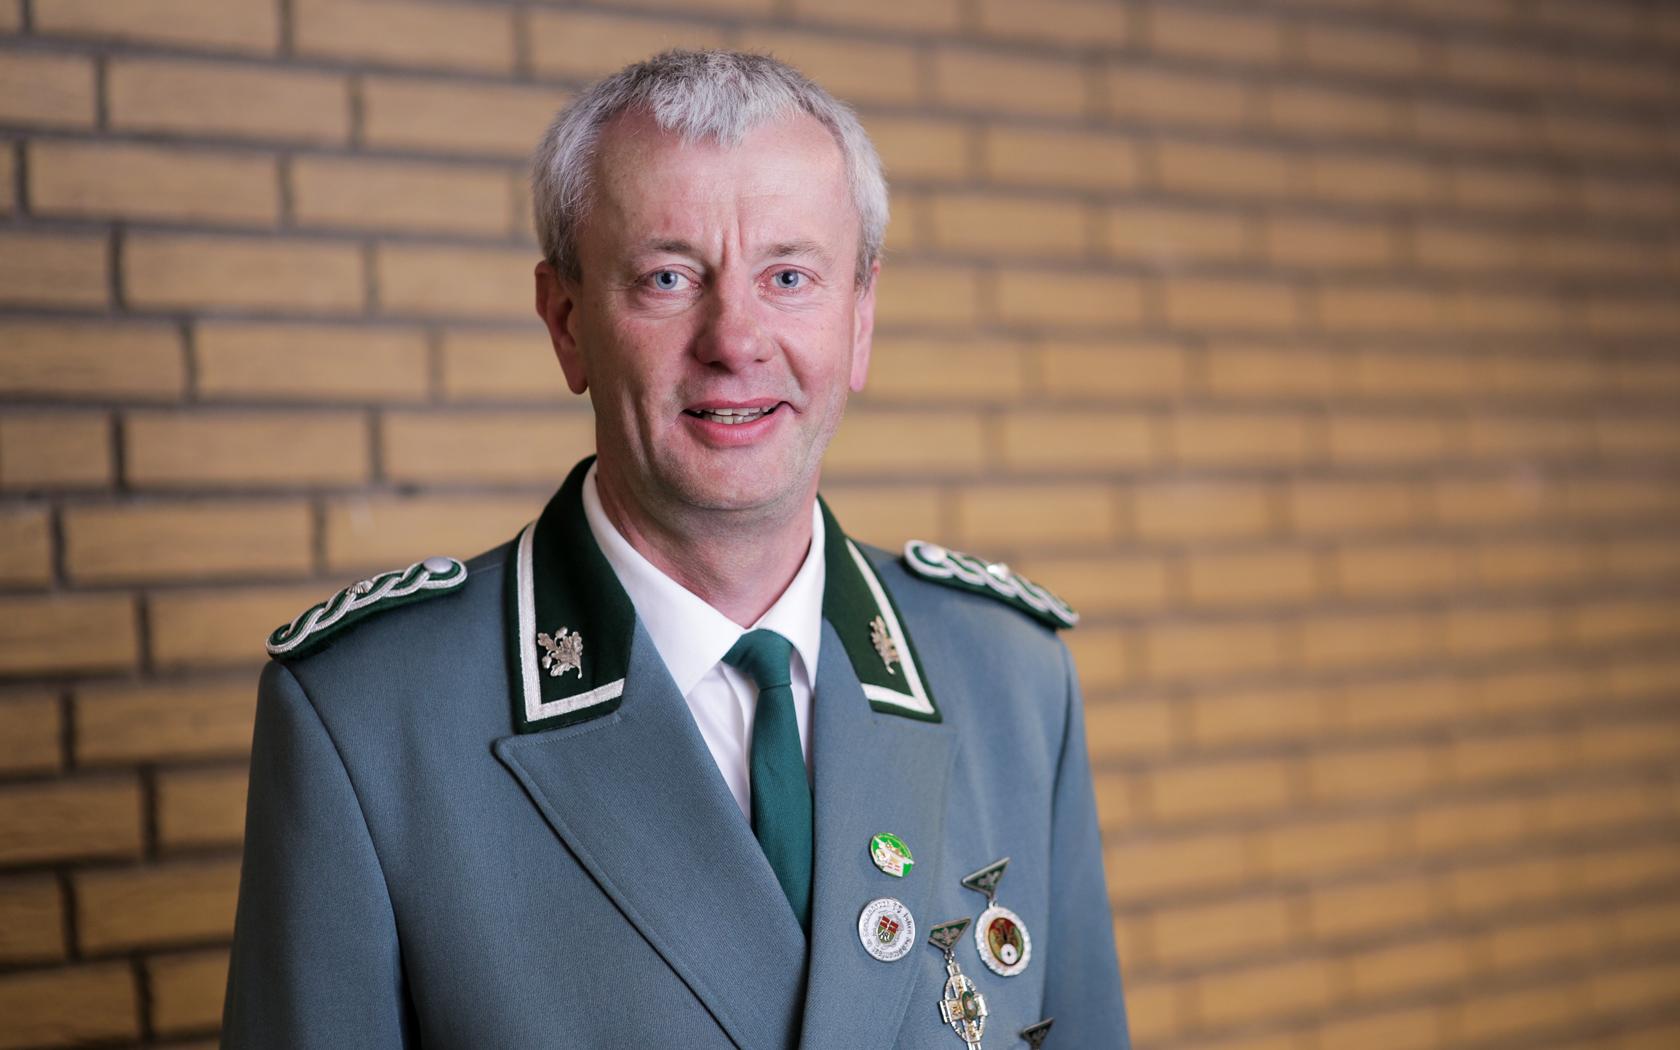 Gerd Bonensteffen